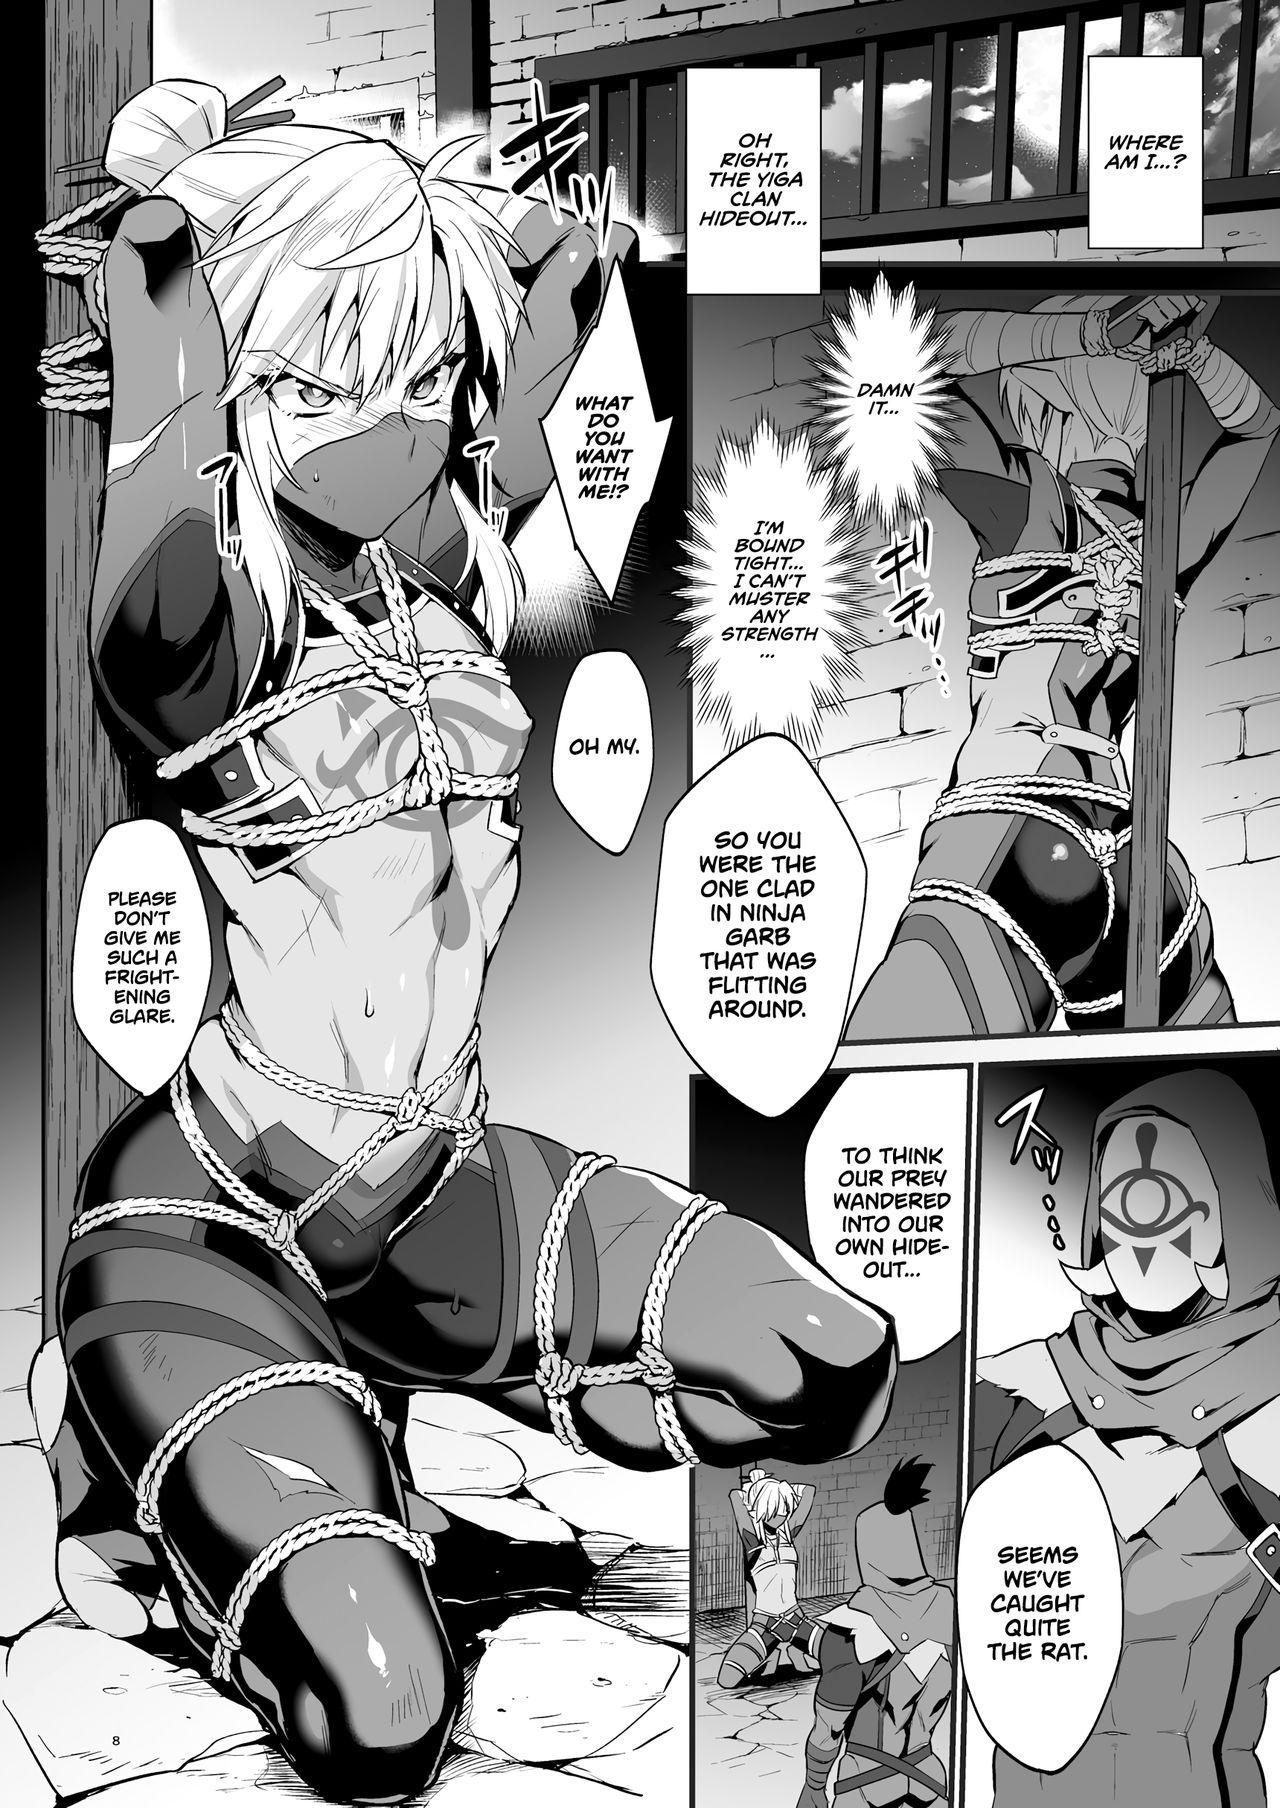 [Morittokoke (Morikoke)] Eiketsu Ninja Gaiden ~Haiboku Hen~ | The Champion's Ninja Side Story ~Failure~ (The Legend of Zelda) [English] =TLL + mrwayne= [Digital] 5